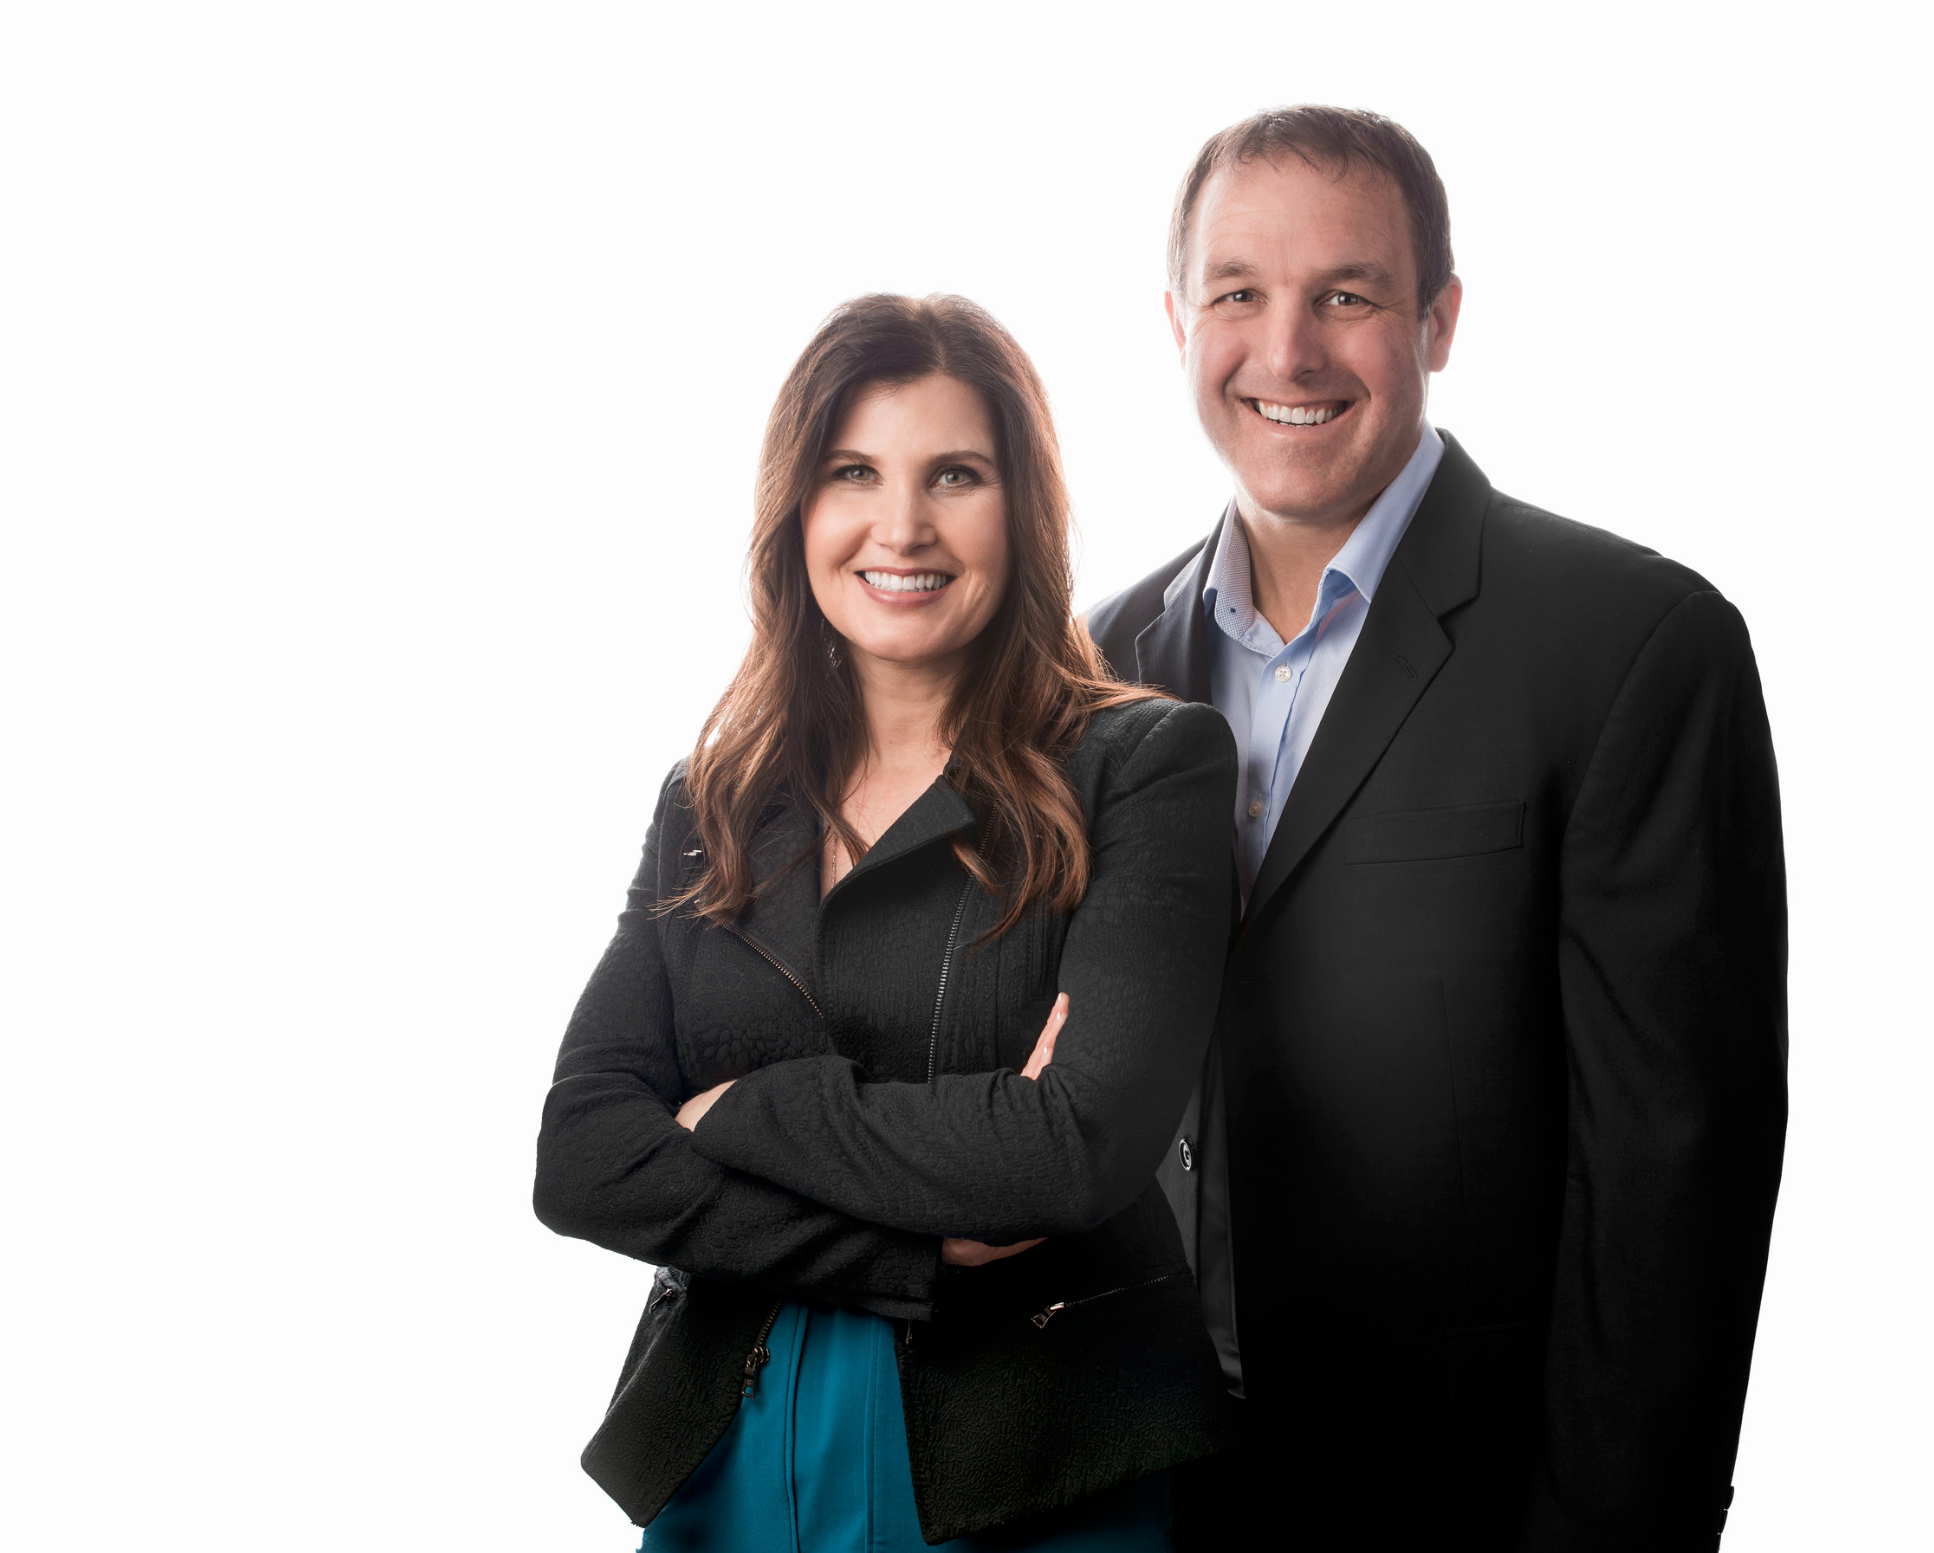 Team staff Everett Seattle marysville headshot studio business linkedin